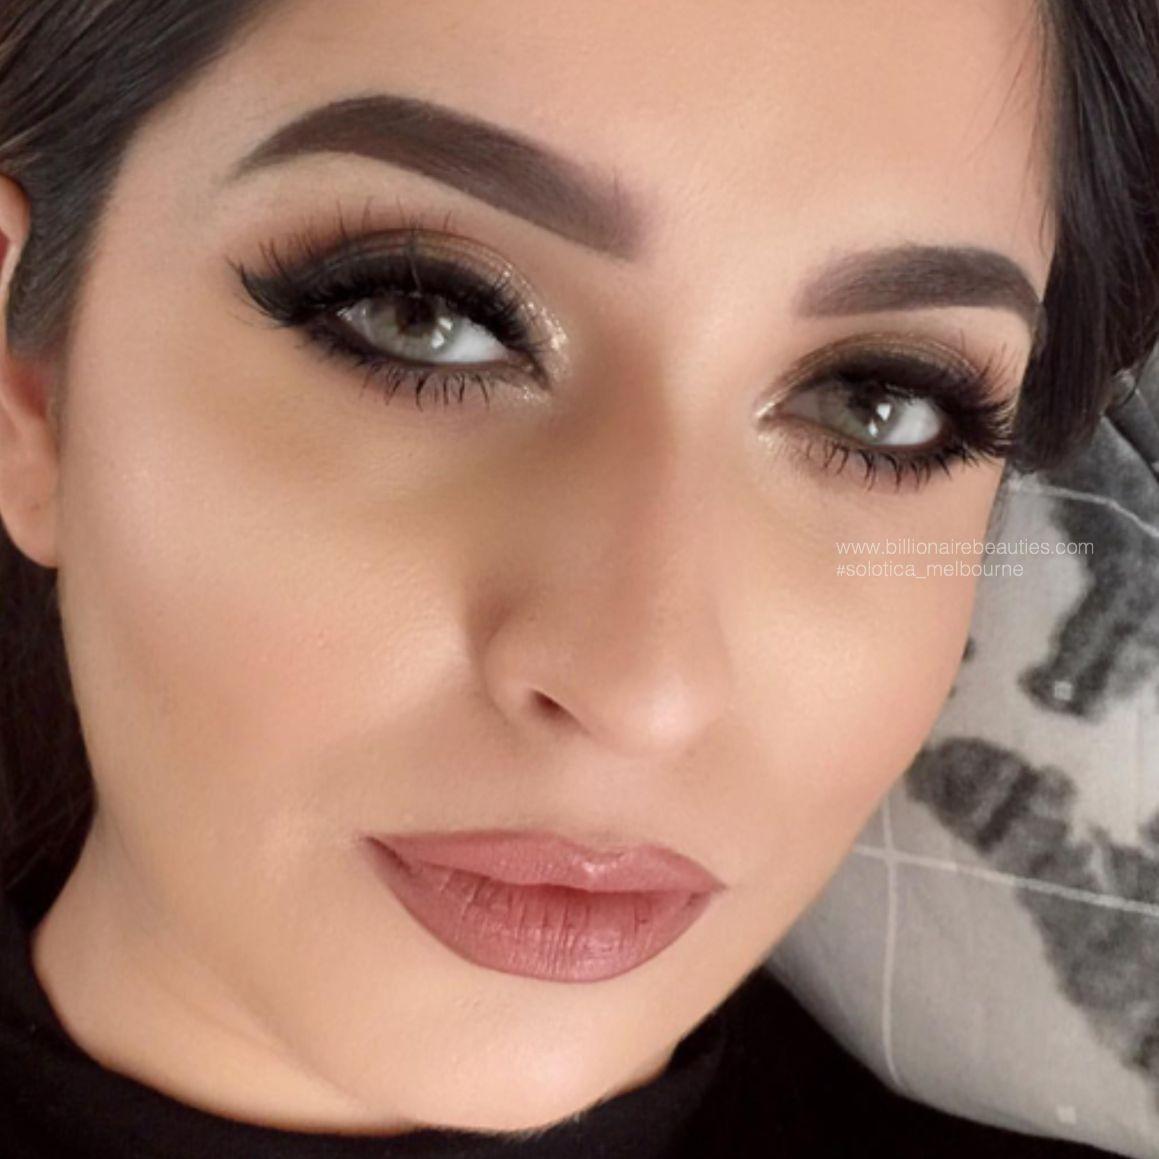 2019 year style- Contact rai Aishwarya lenses